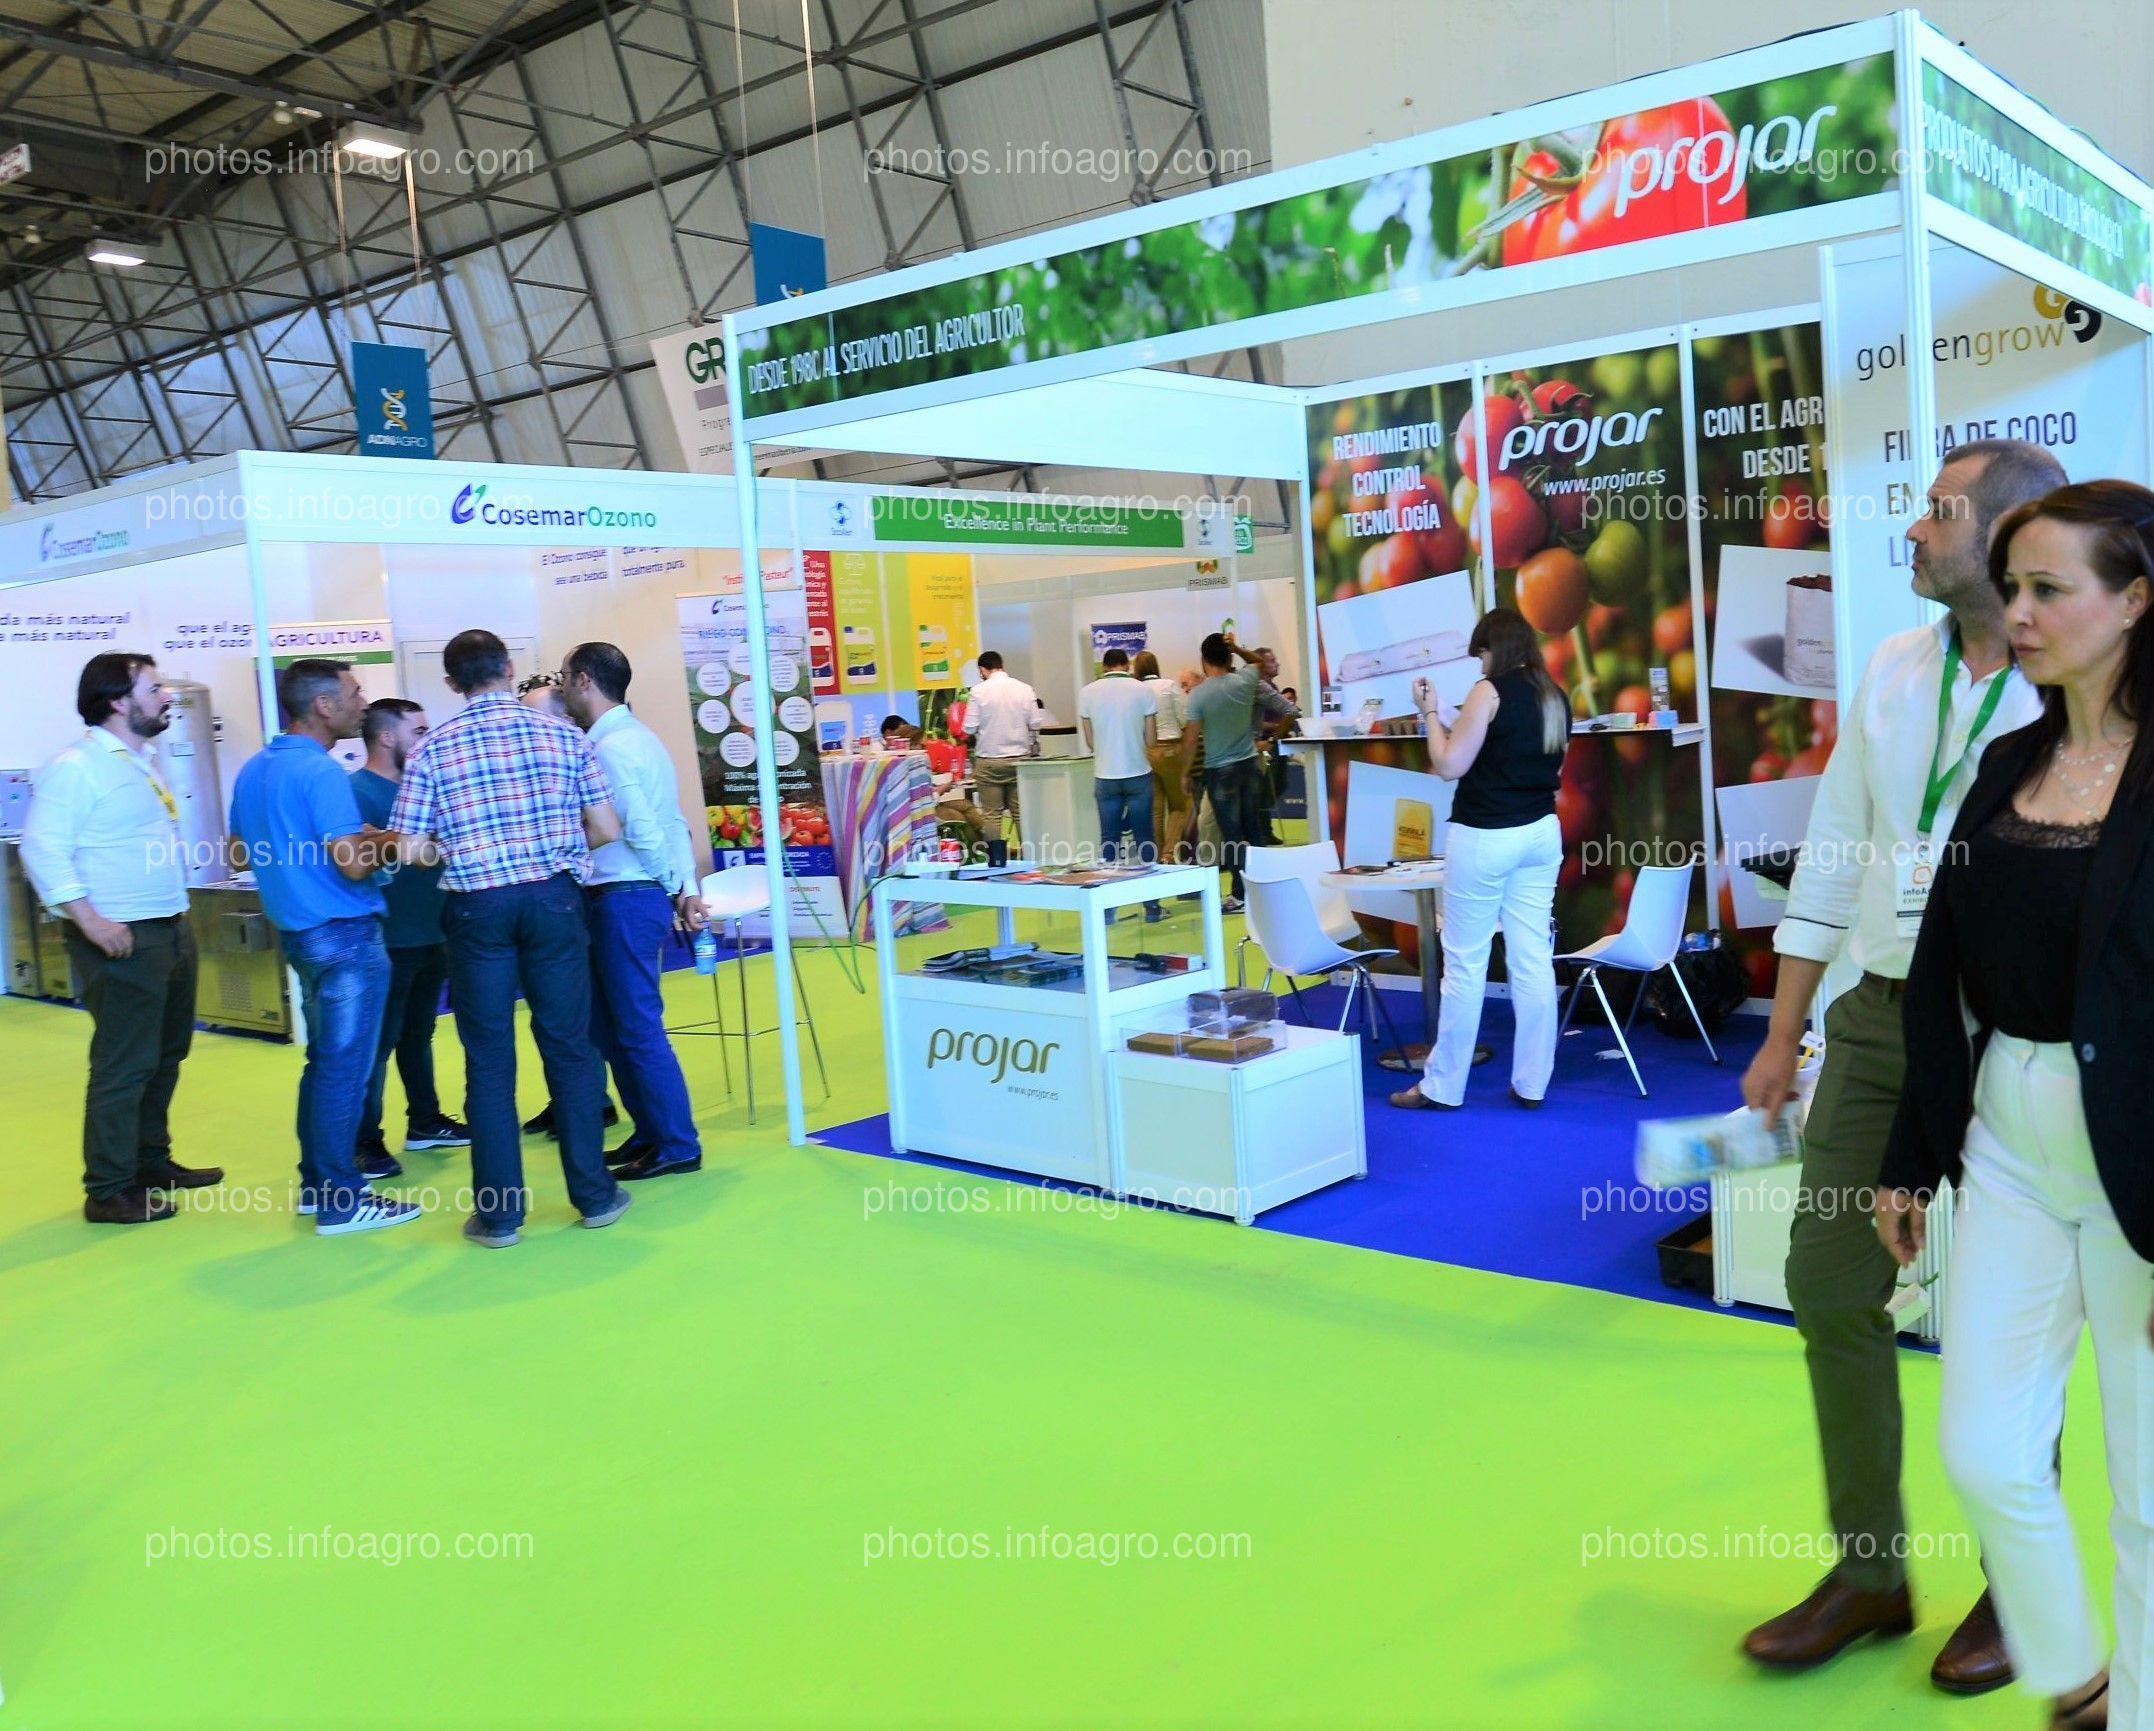 Projar - Stand Infoagro Exhibition